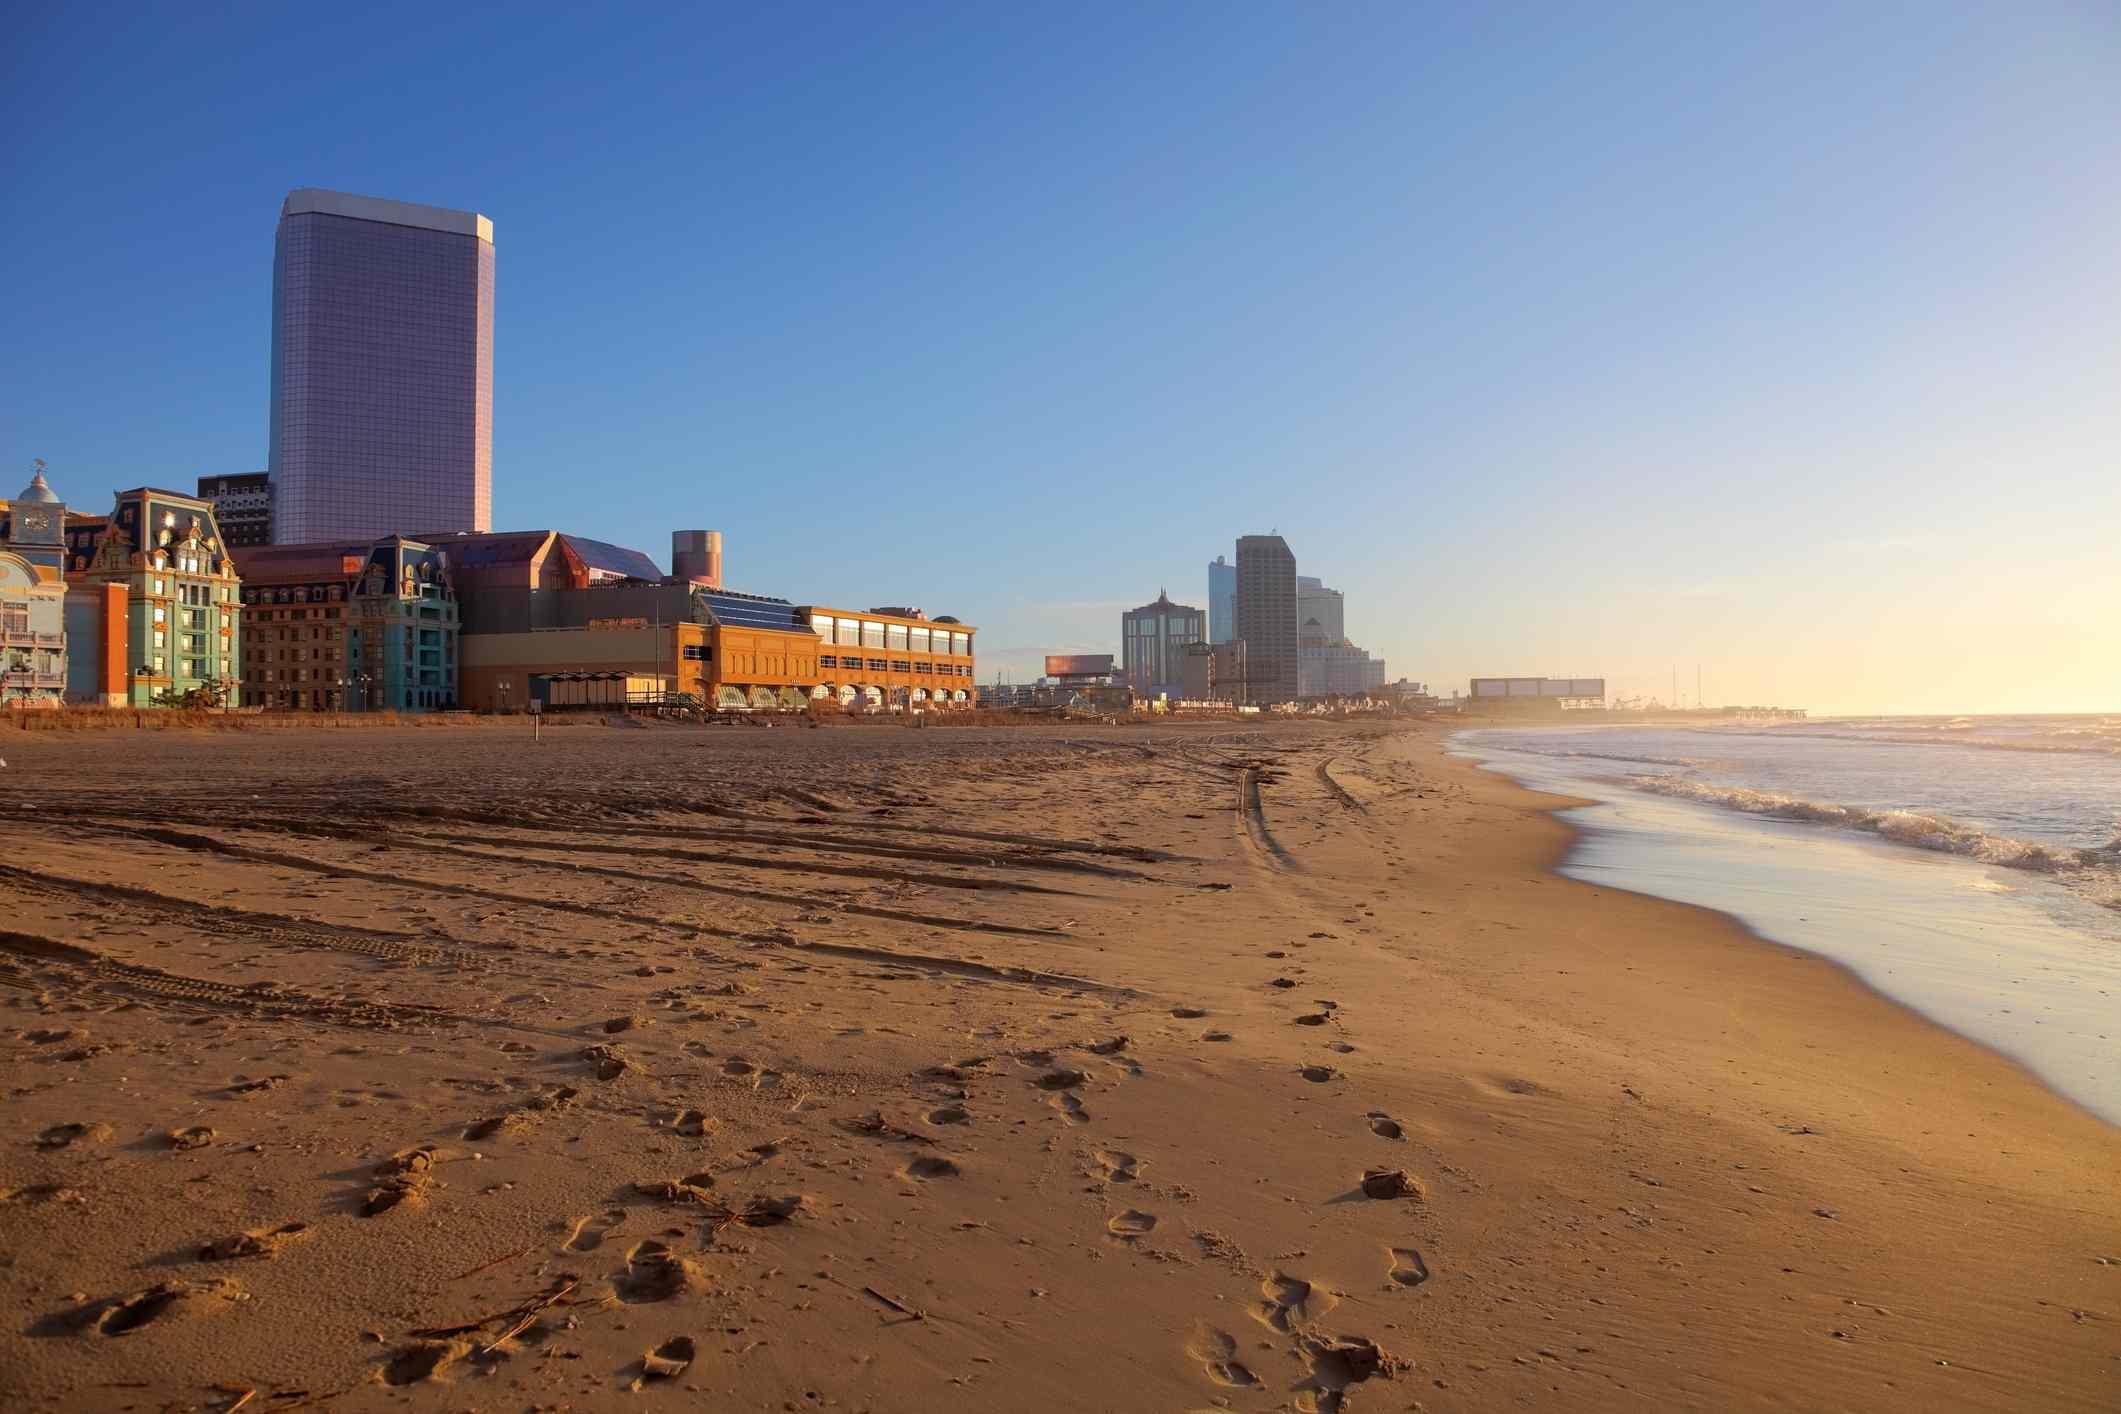 Atlantic City coastline with hotels